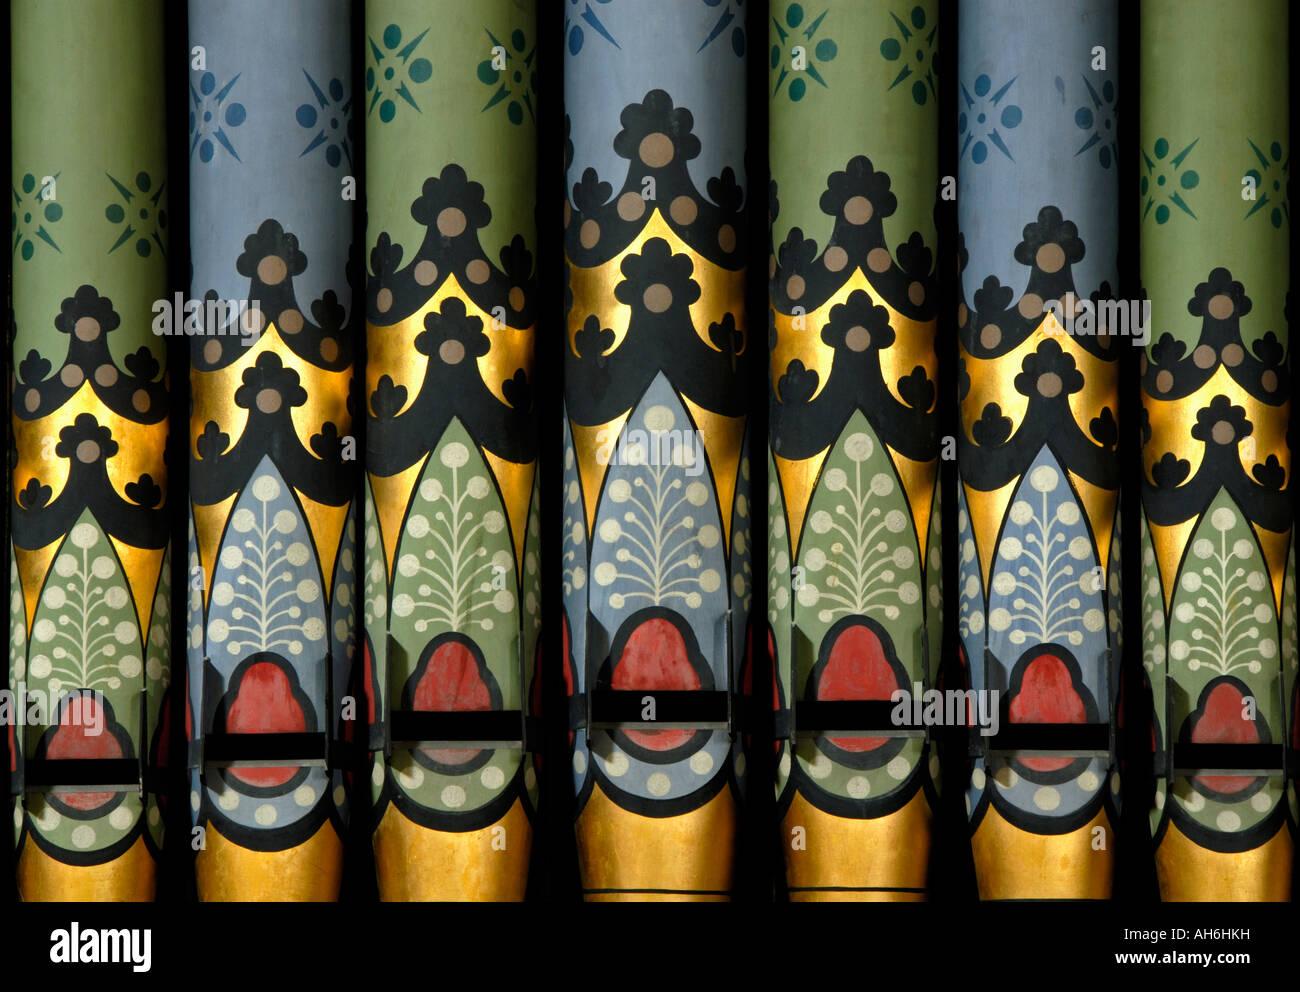 organ-pipes-detail-all-saints-church-orton-cumbria-england-u-k-europe-AH6HKH.jpg